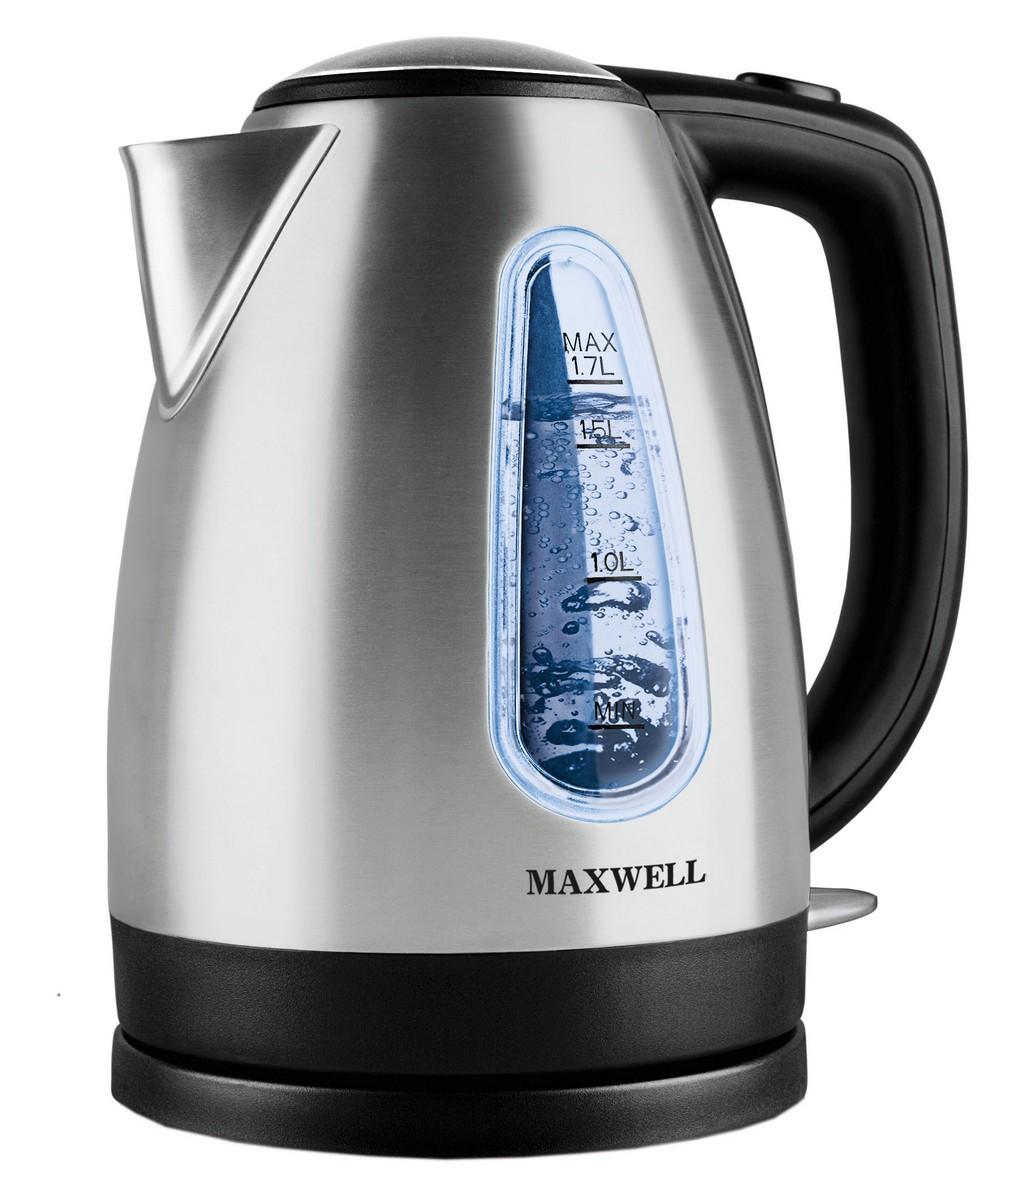 Хлебопечка maxwell отзывы 6